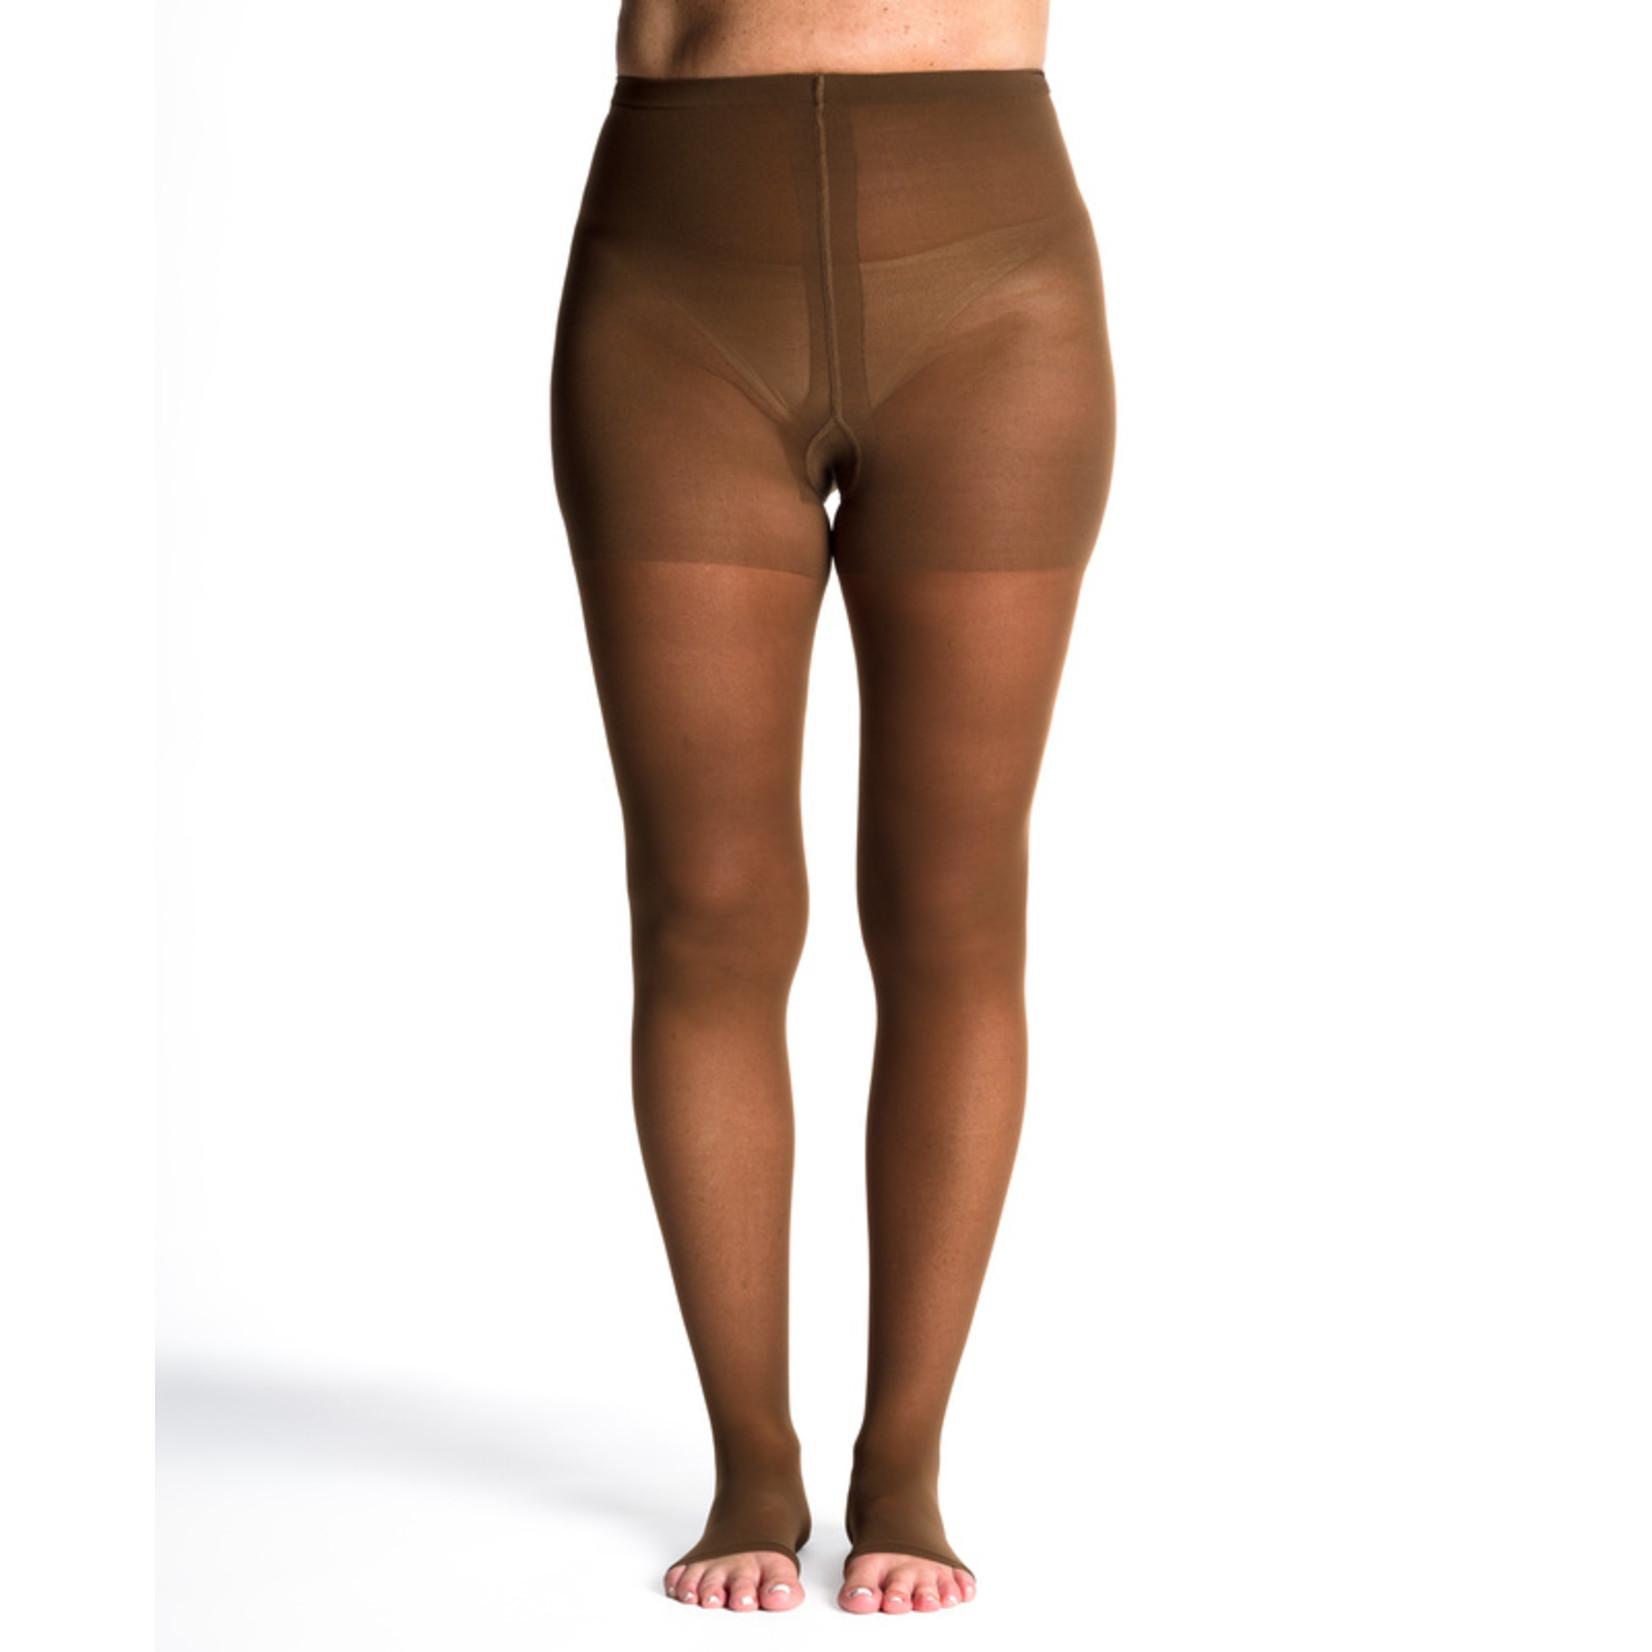 SIGVARIS Women's Style Sheer Pantyhose 30-40mmHg